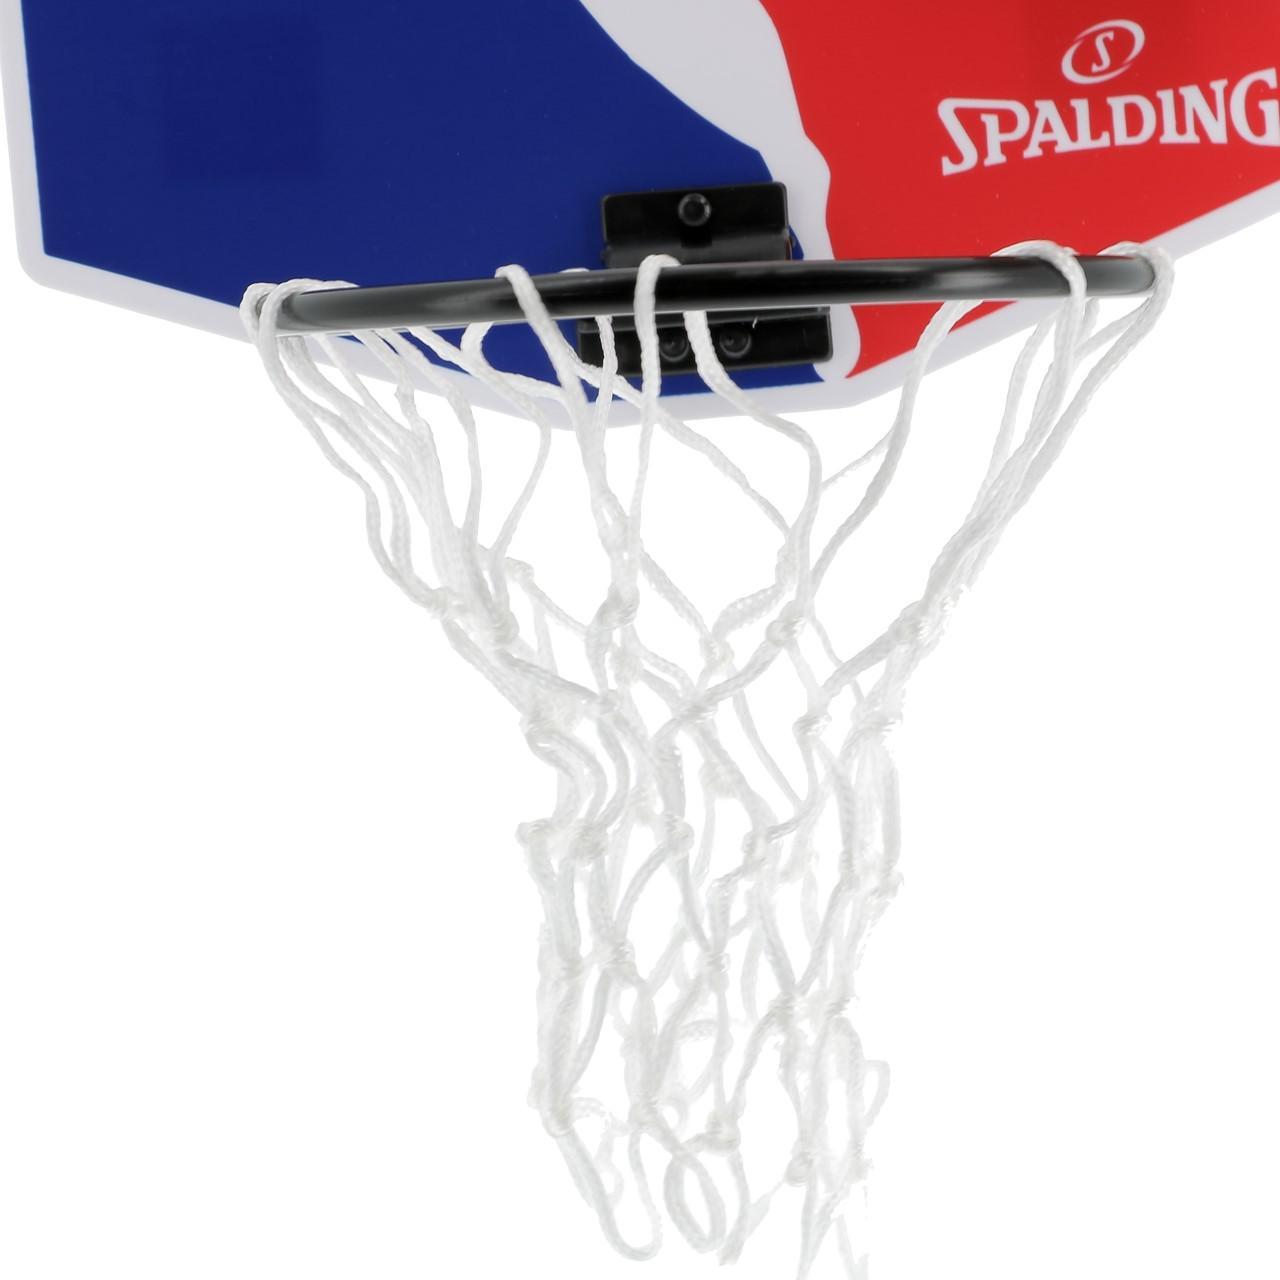 Panel-of-Basketball-Spalding-NBA-Micropanier-Blue-40158-New thumbnail 2